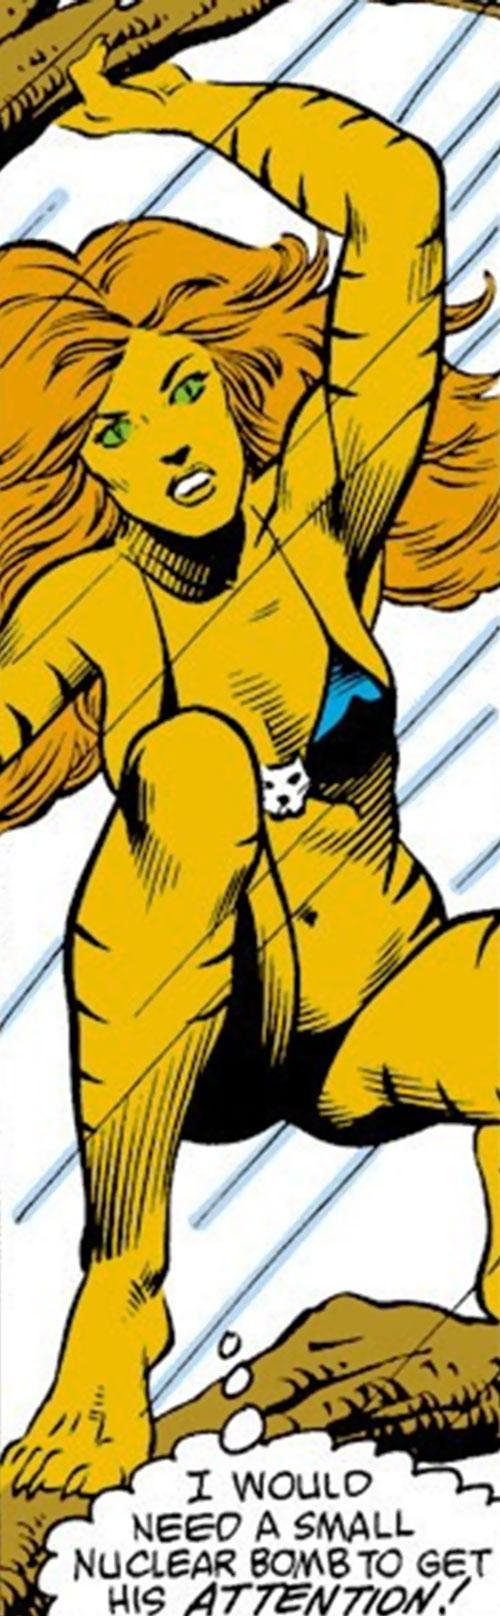 Tigra of the Avengers West Coast (Marvel Comics) on a tree amidst high winds